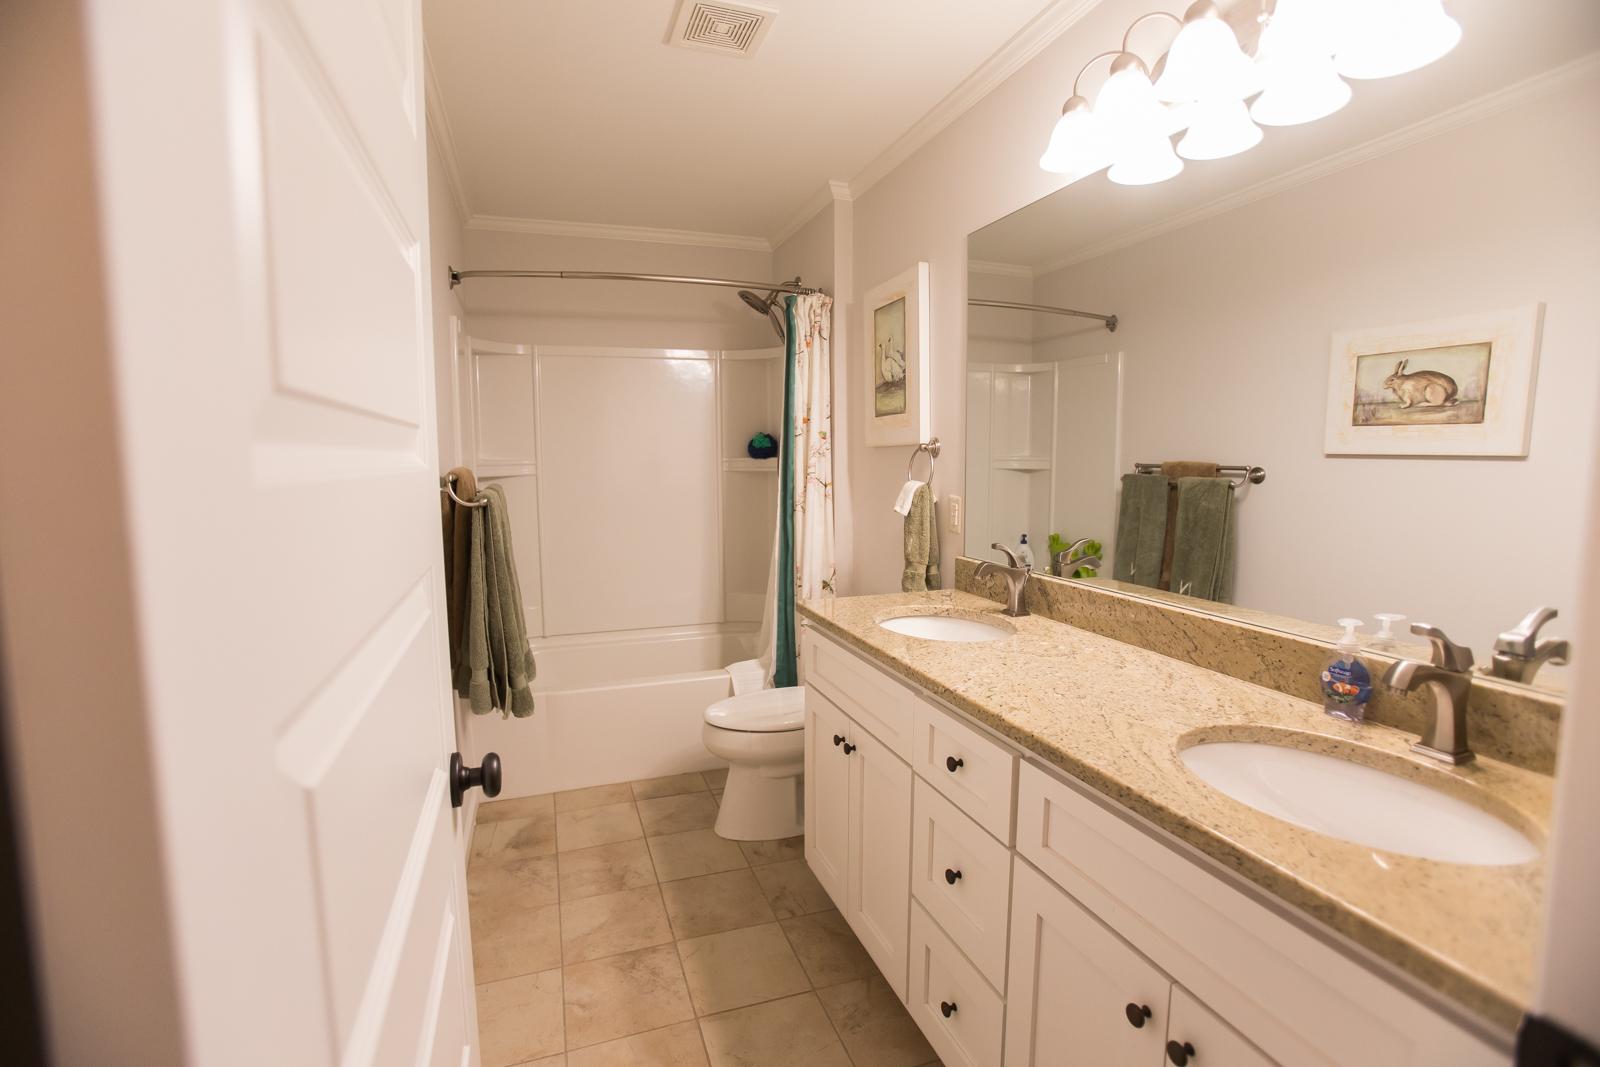 Additional photo for property listing at 306 Wembley Road 306 Wembley Road Greenville, South Carolina 29607 United States